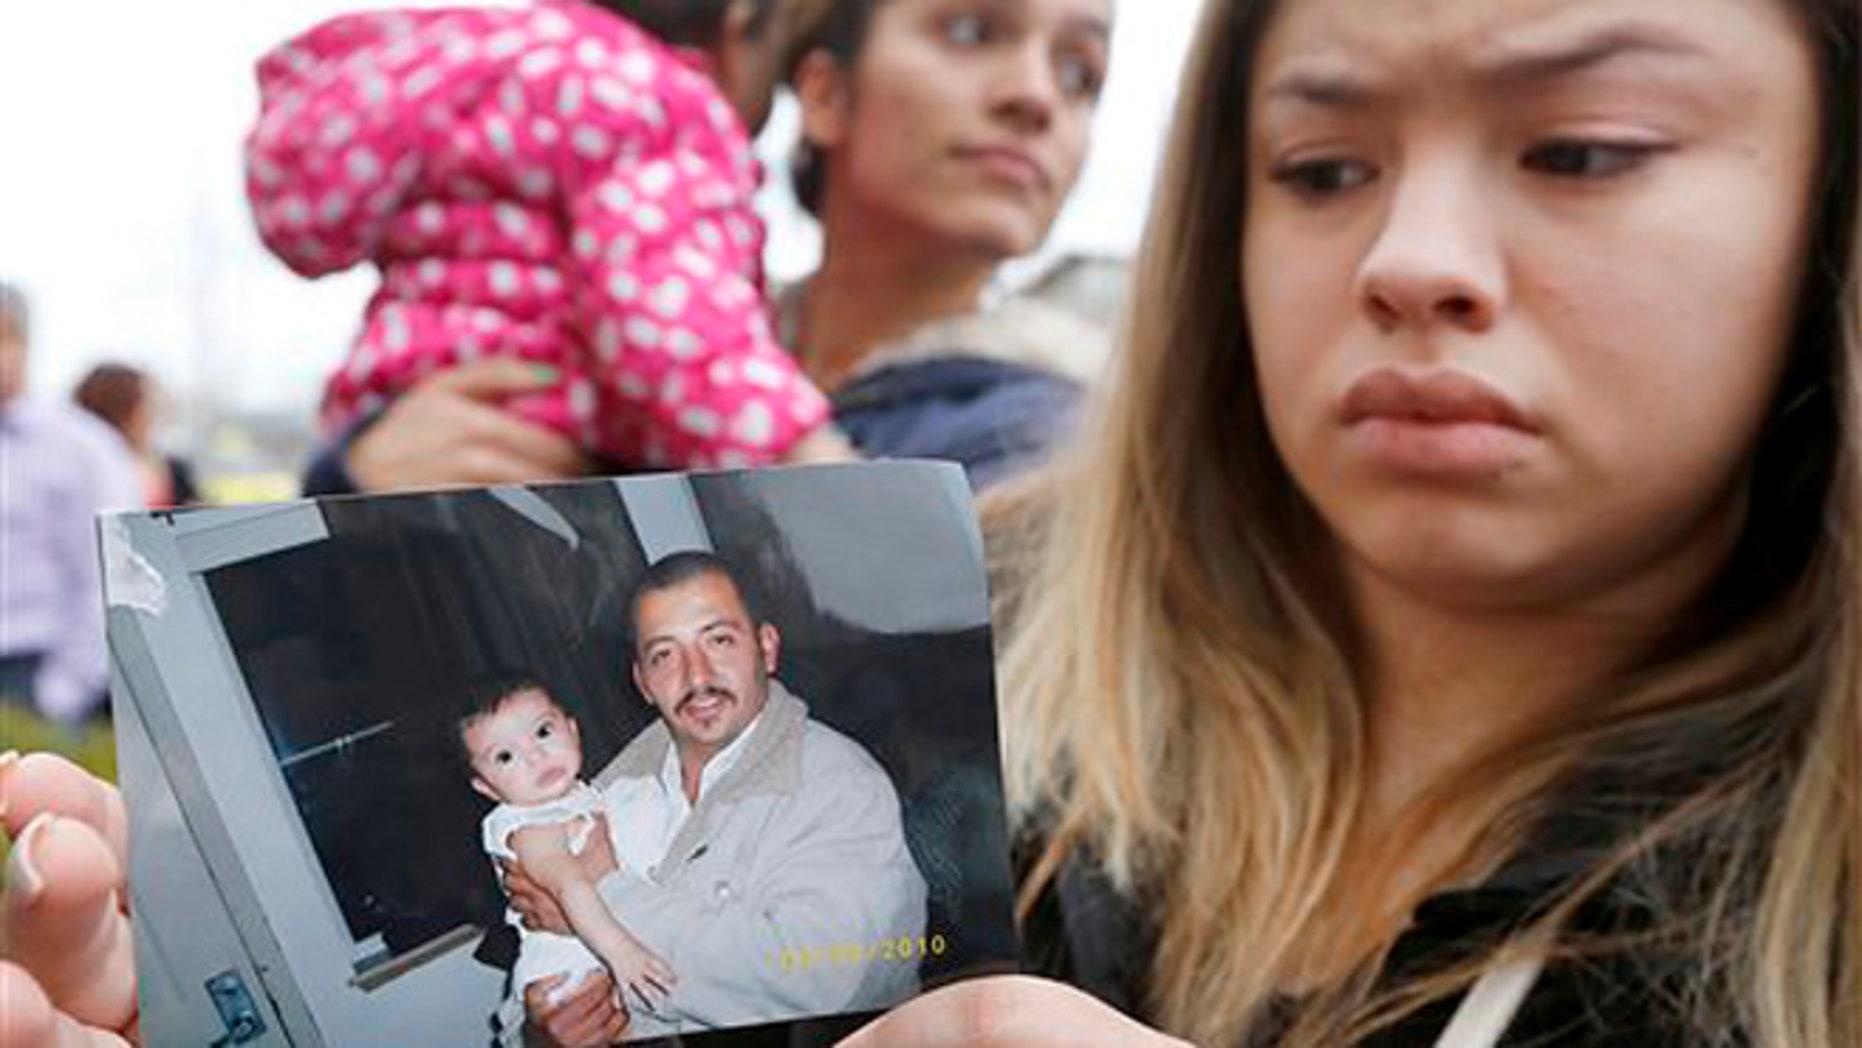 Erika Zambrano holds a 2010 photo of Antonio Zambrano-Montes, outside the city hall in Pasco, Wash.